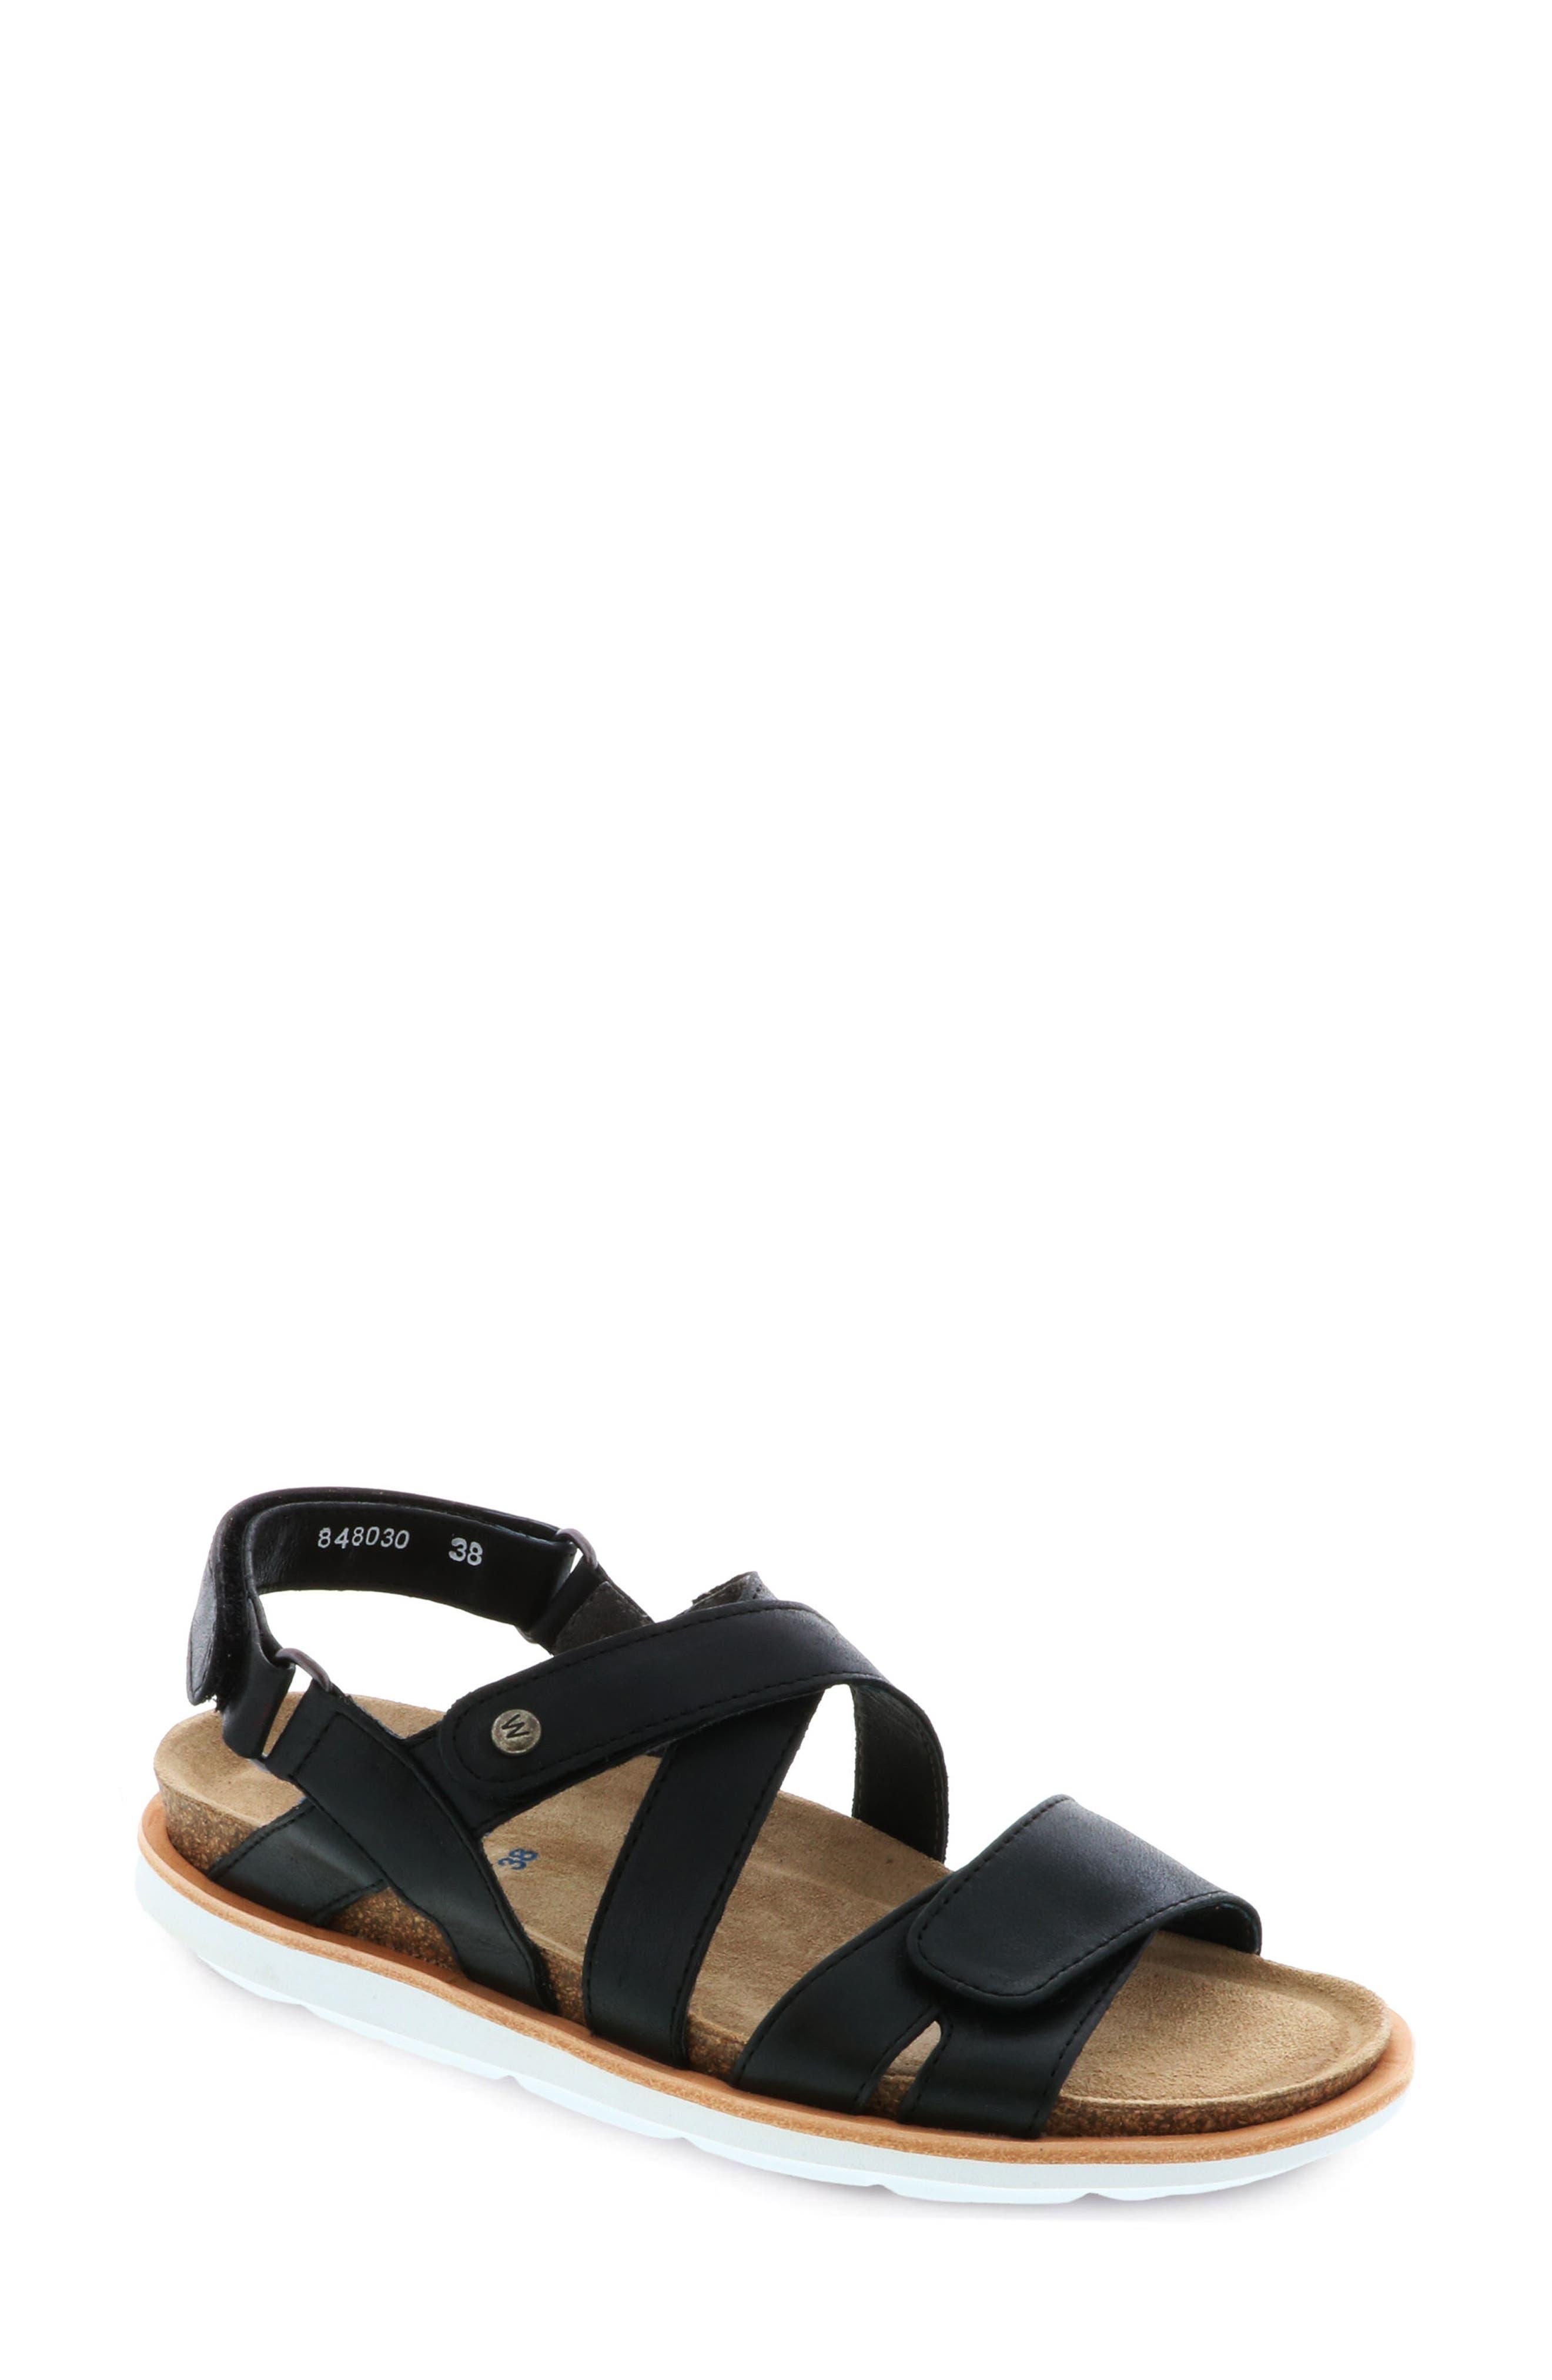 Sunstone Sandal,                             Main thumbnail 1, color,                             Black Summer